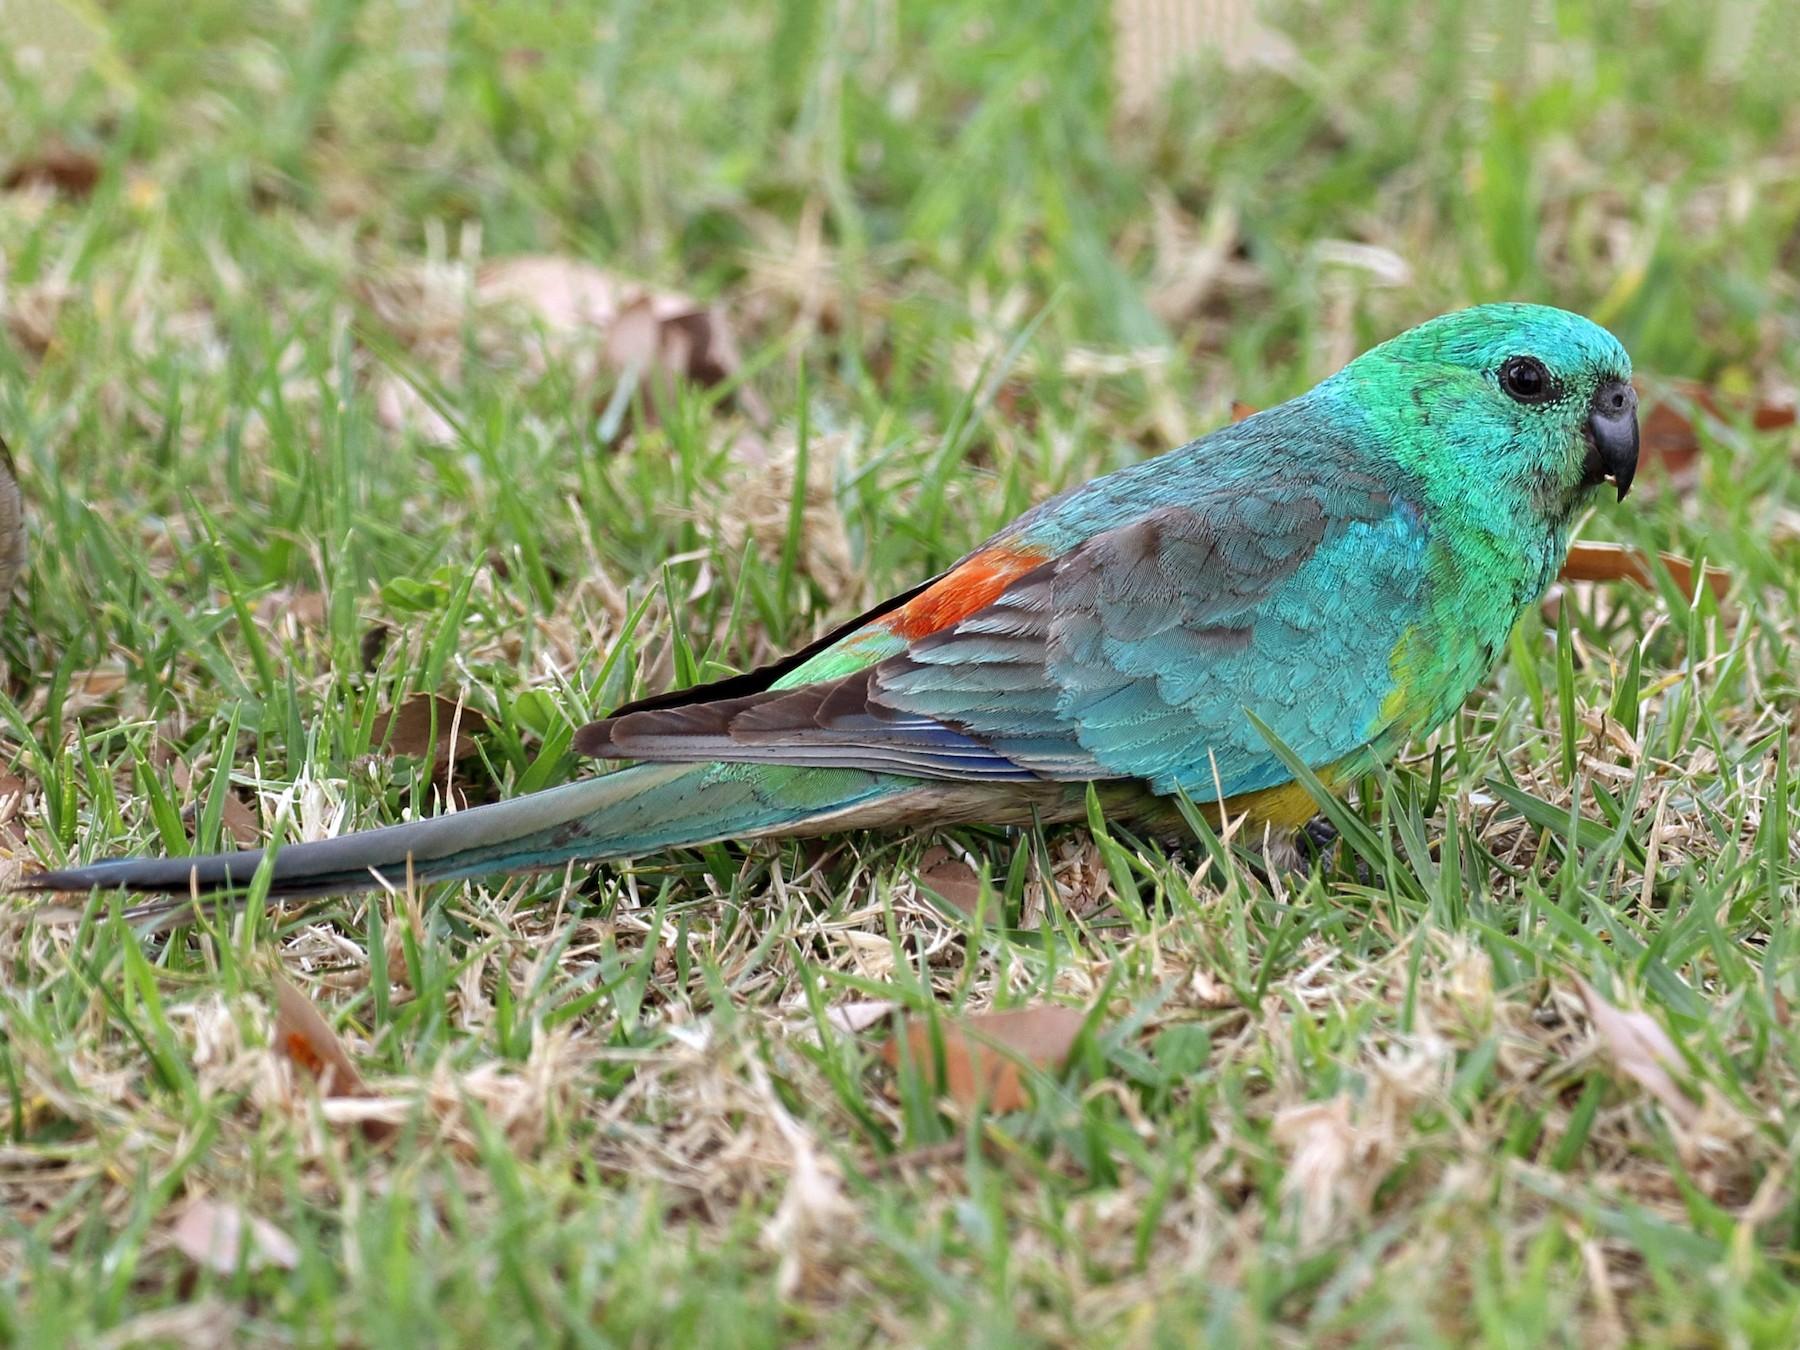 Red-rumped Parrot - Michael Rutkowski